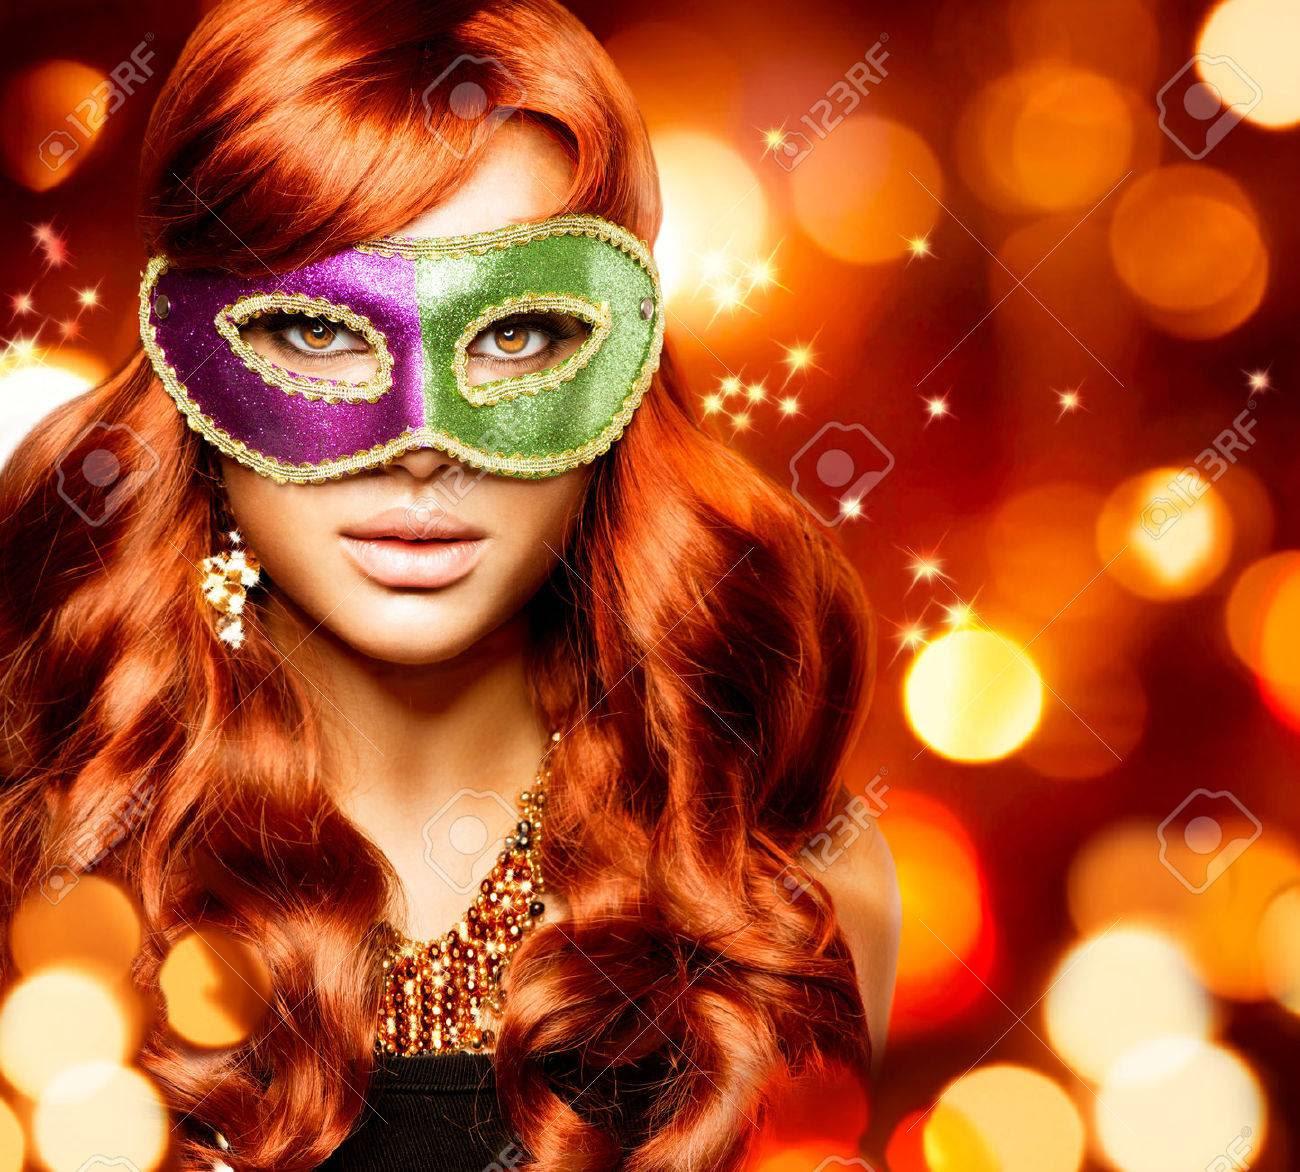 Картинки по запросу фото девушка в маске